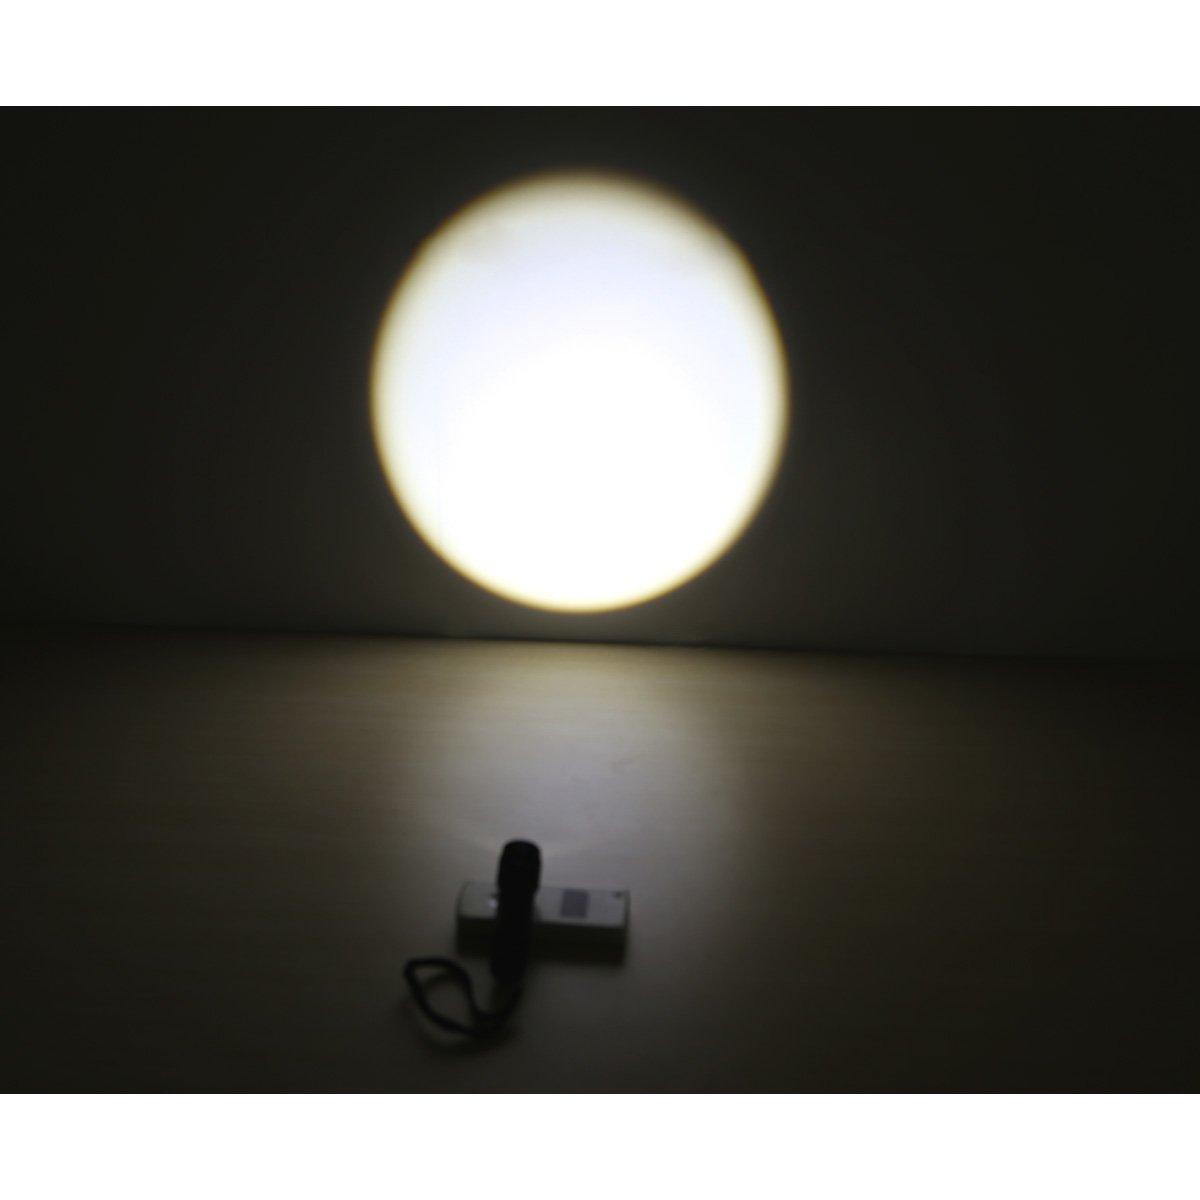 http://ecx.images-amazon.com/images/I/51-2okvkO8L._SL1200_.jpg